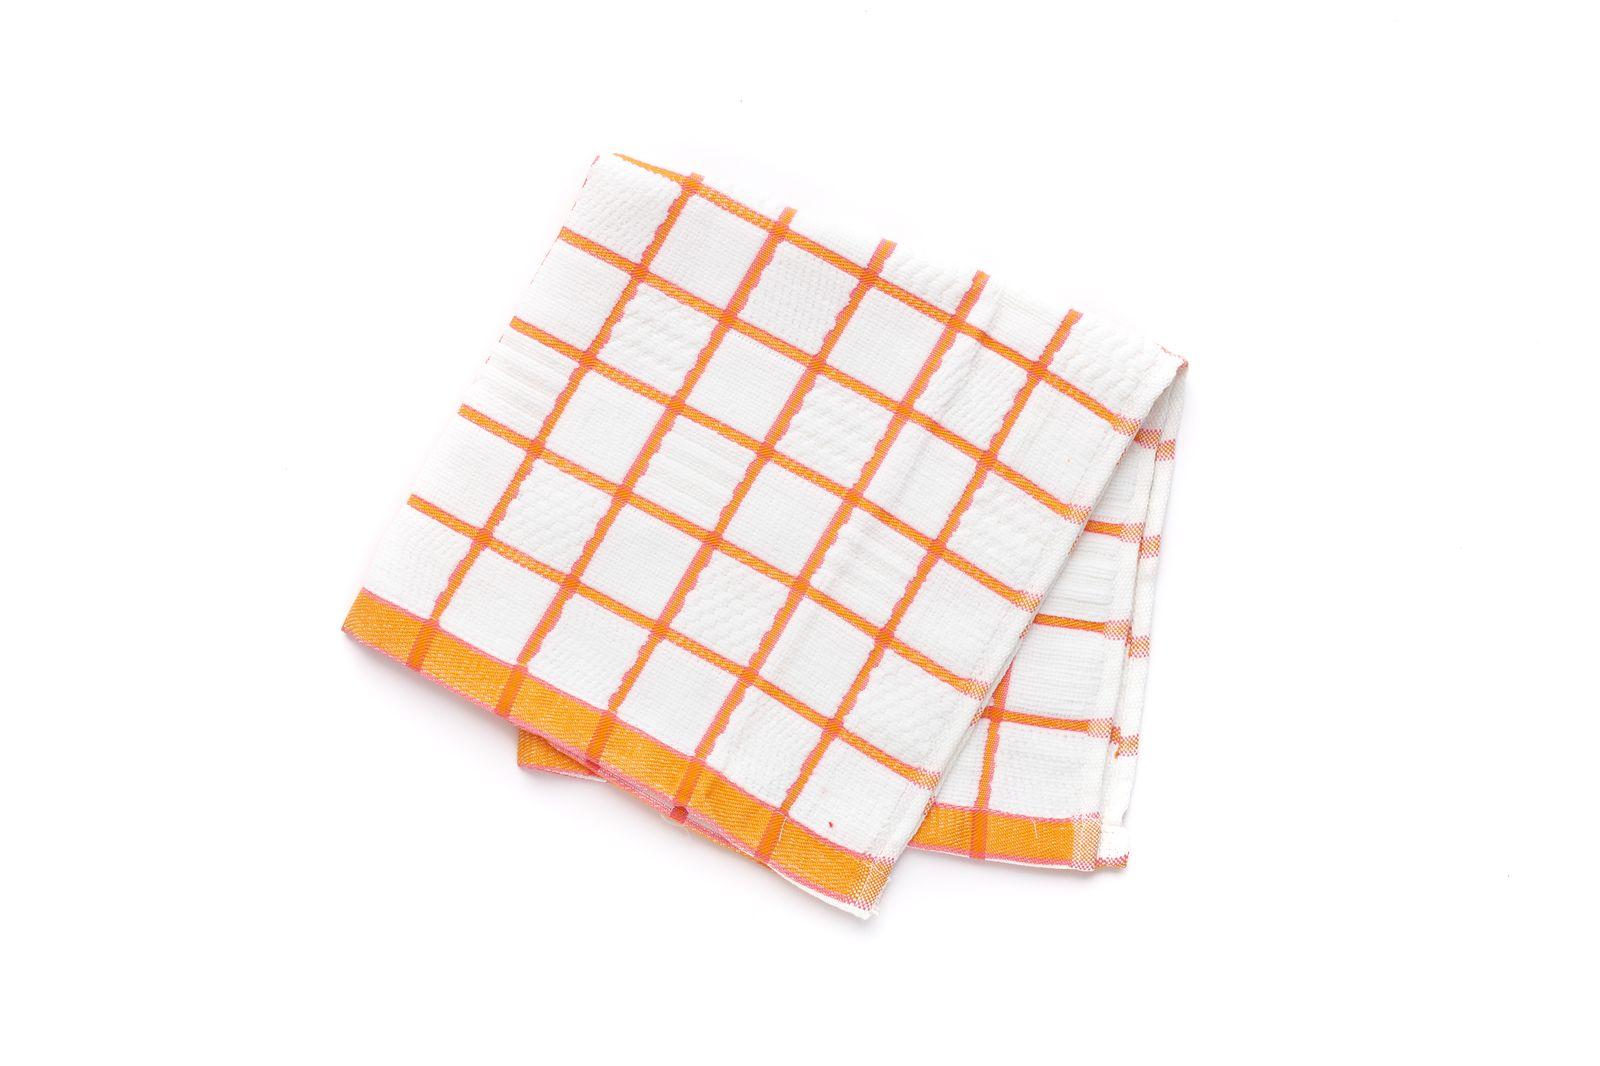 Салфетка-полотенце кухонное микрофибра/хлопок 52*52см по цене 465